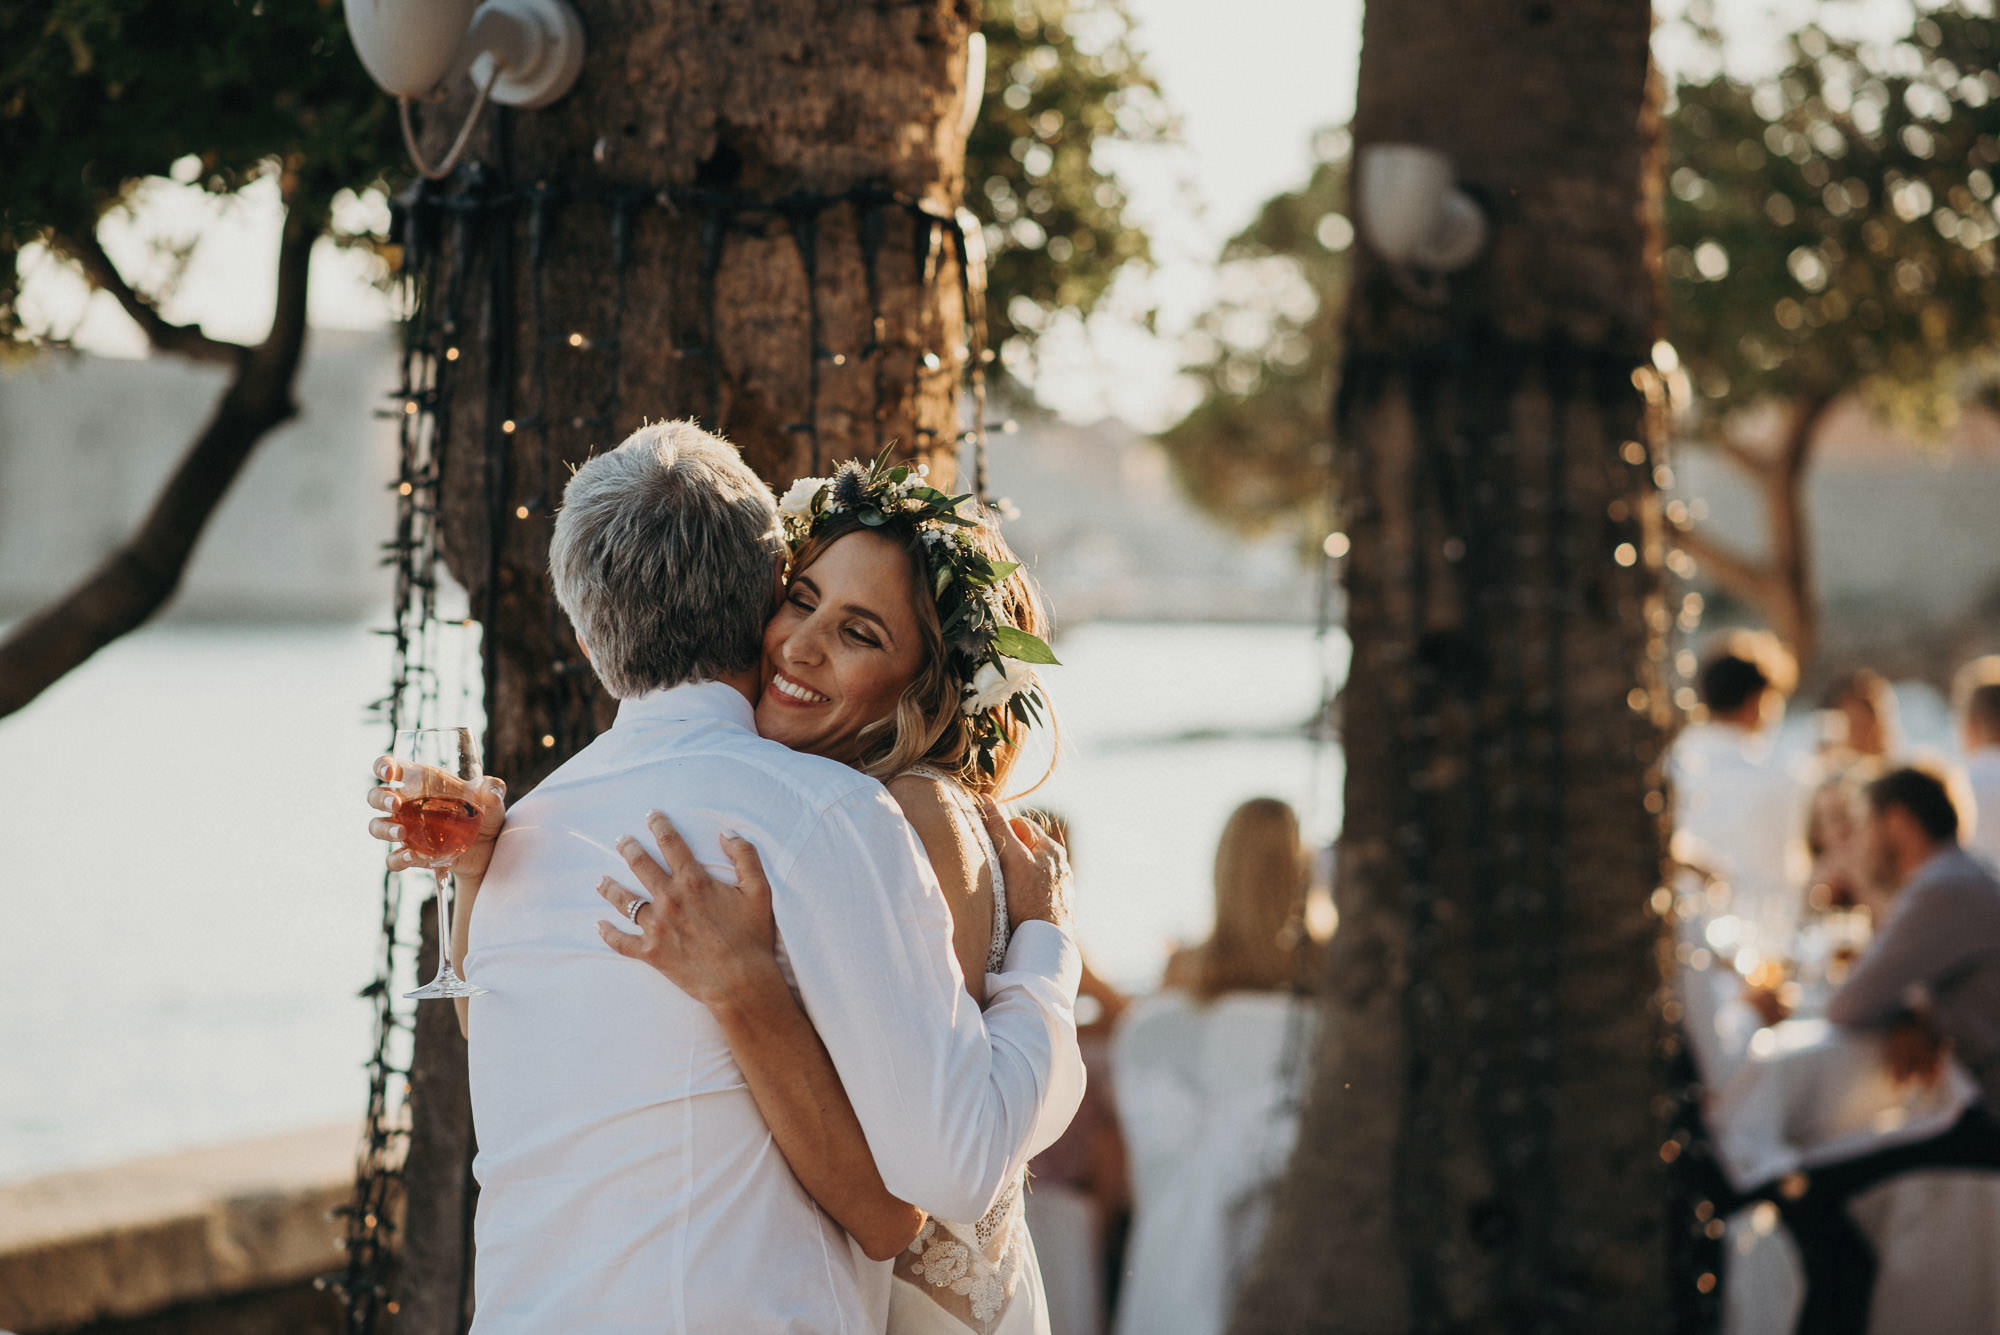 dubrovnik_croatia_wedding_photographer-jere_satamo-destination_weddings-067-web.jpg